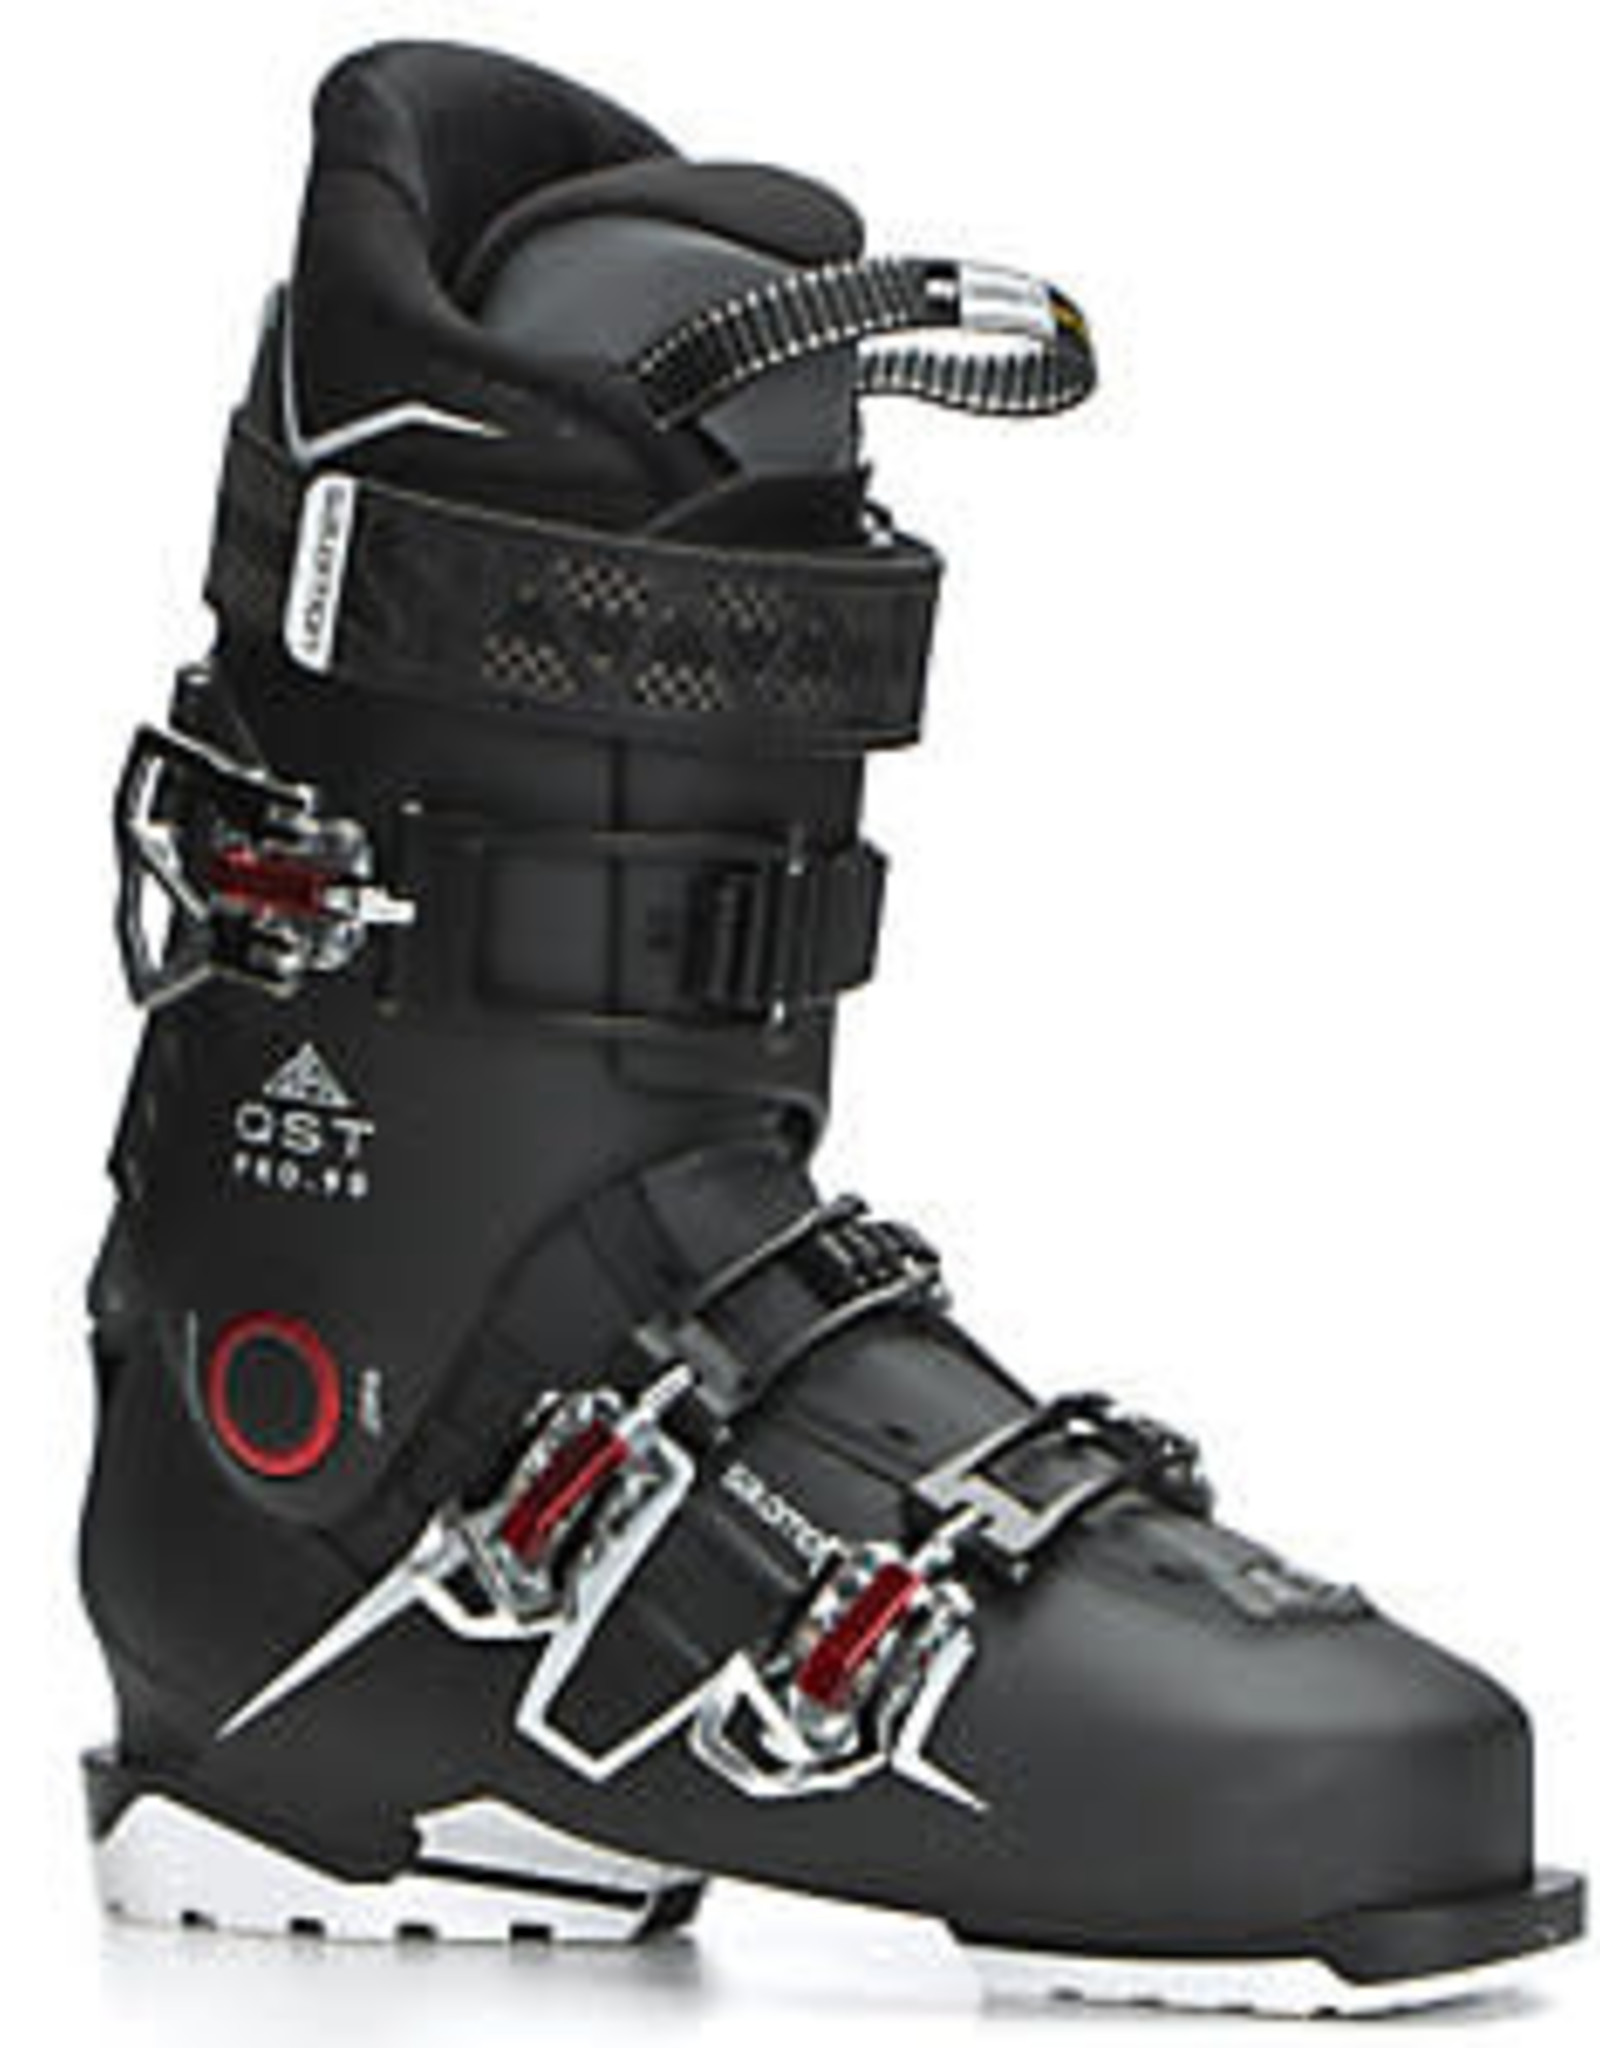 Salomon 2018 Salomon Alp Boots QST Pro 90 Black/Anthra/Rd Size 25.5